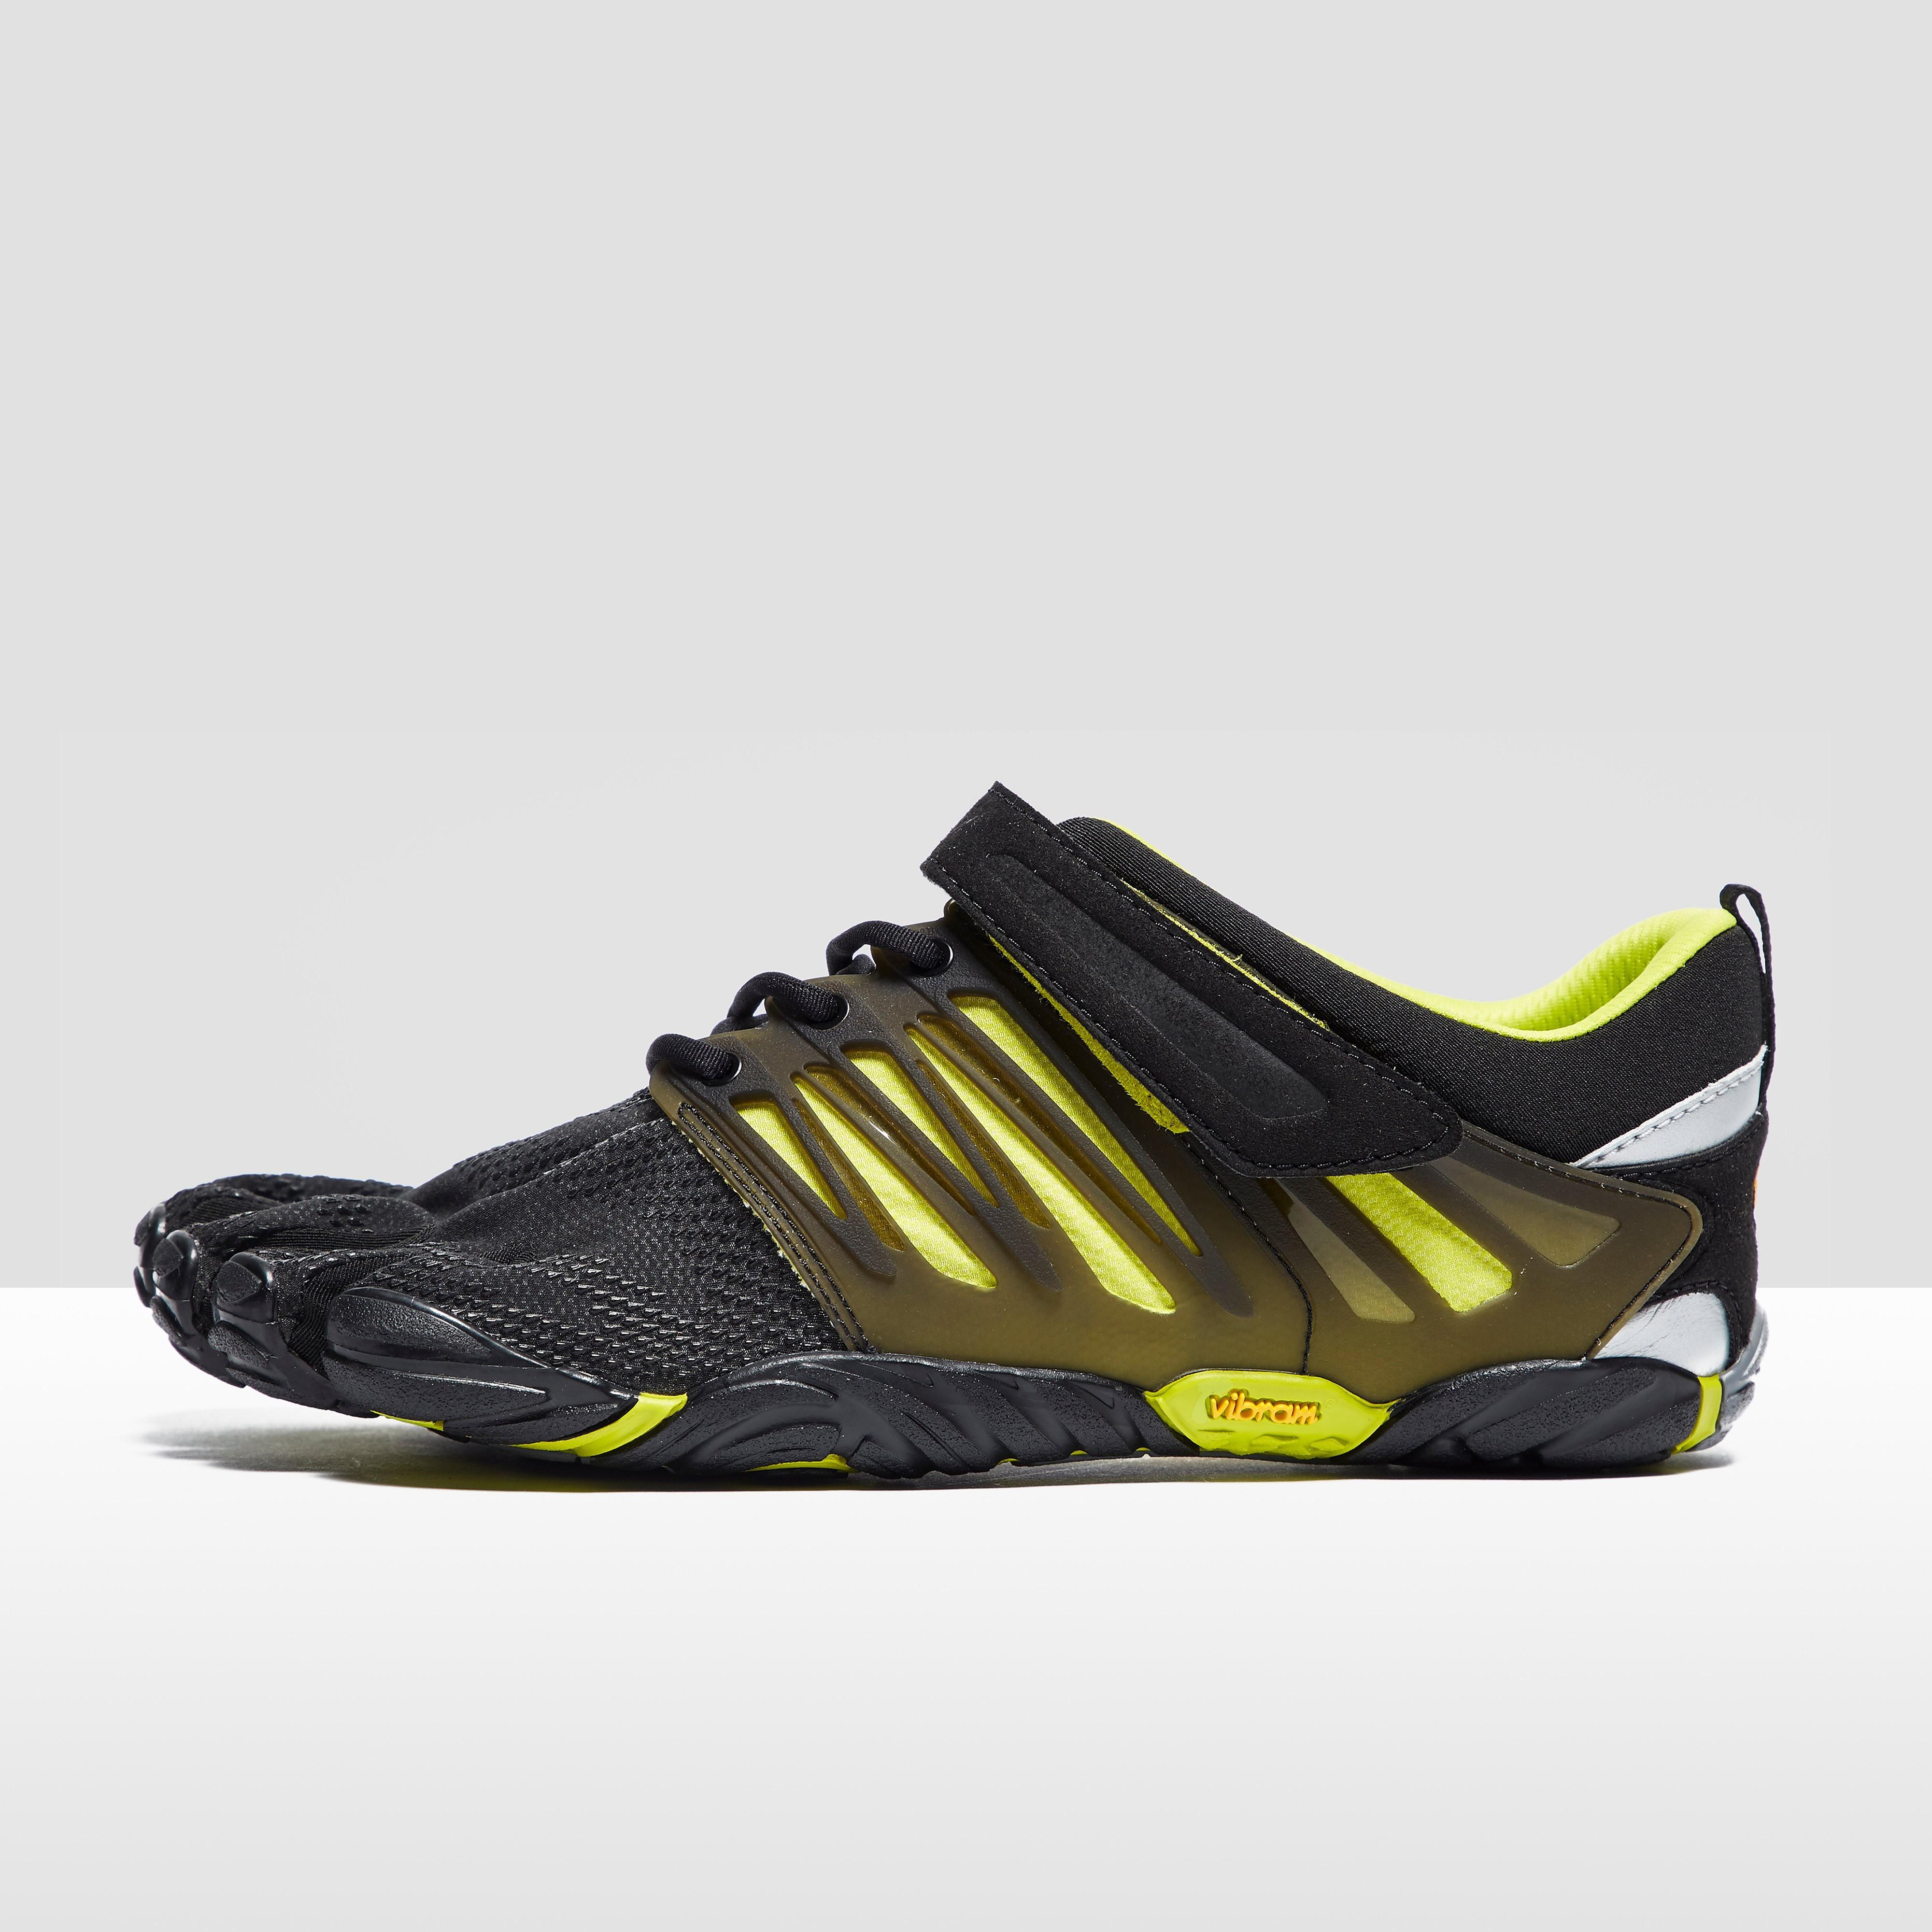 Vibram Five Fingers V-Train Men's Training Shoes